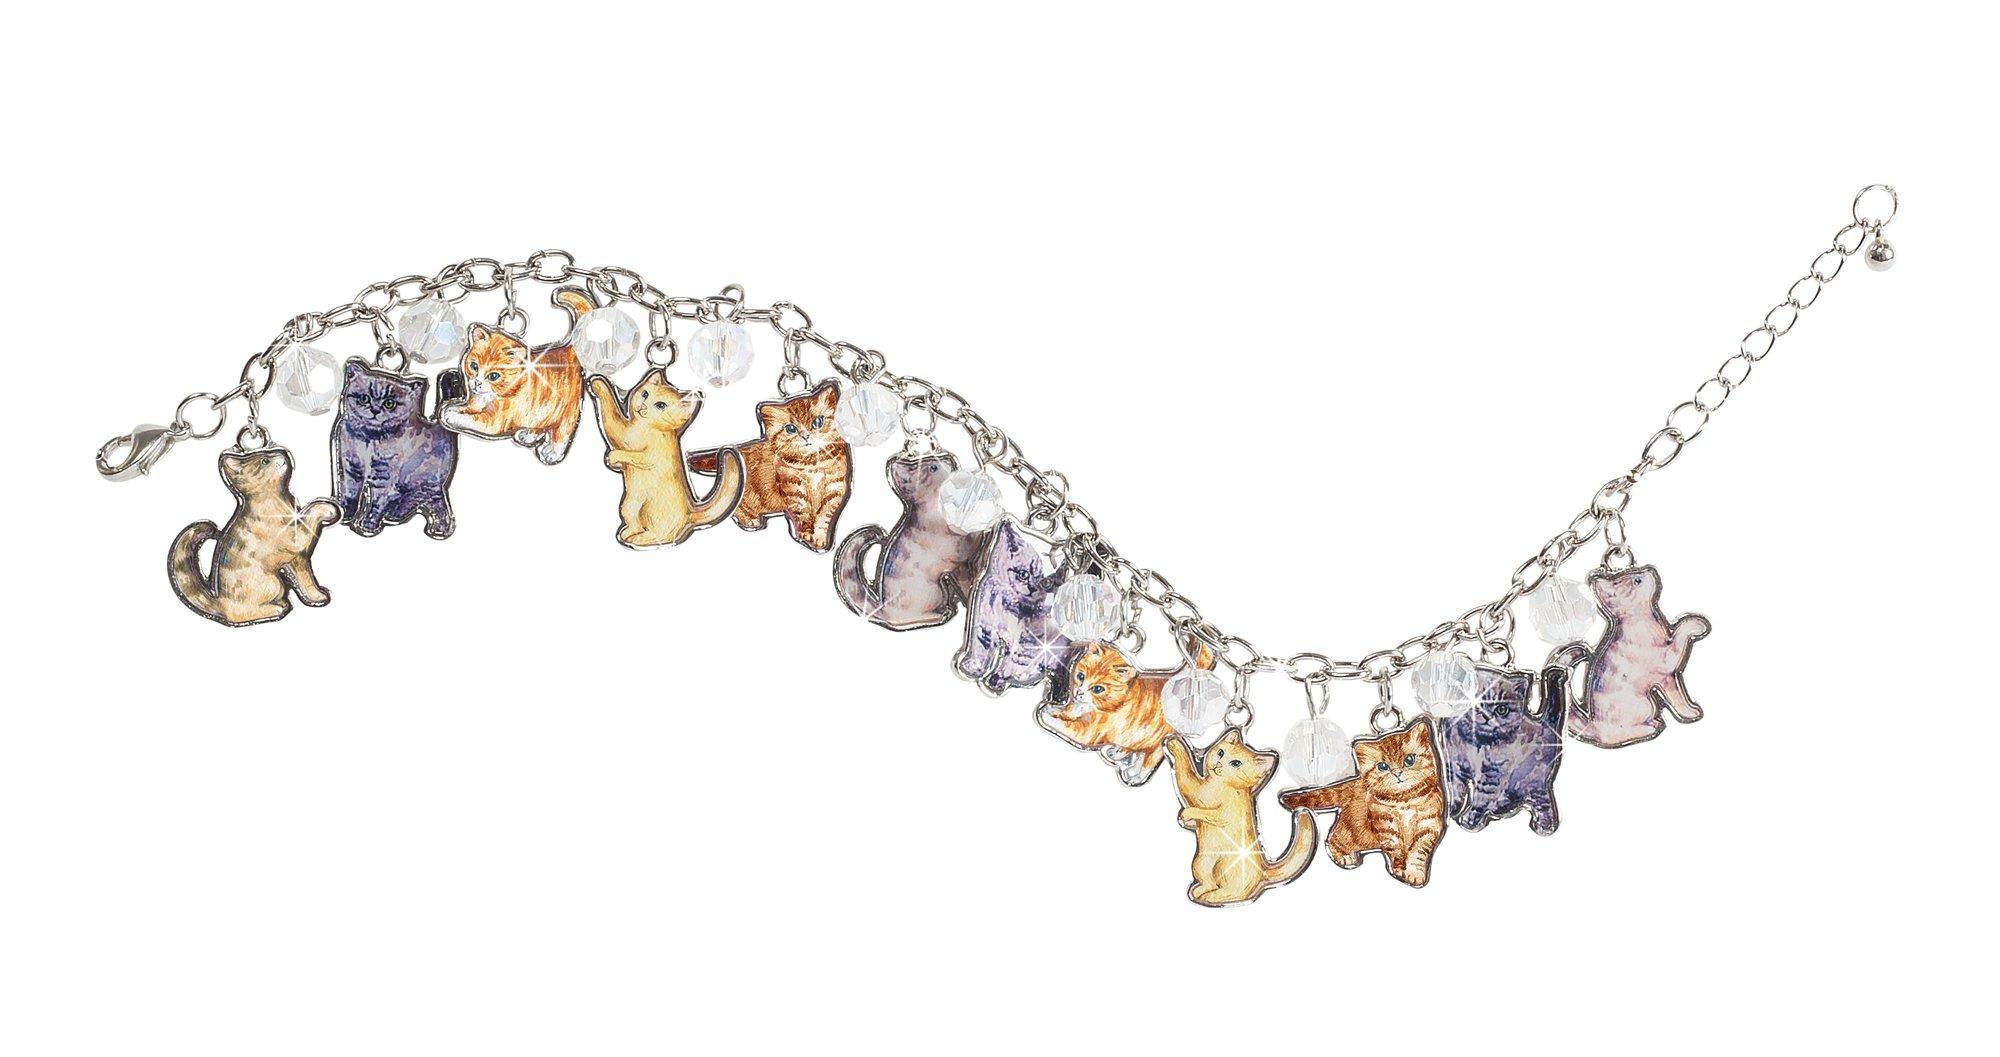 The Paragon Women's Bracelet - Cat Lovers Charm Bracelet, Playful Kitty Adjustable Link Jewelry